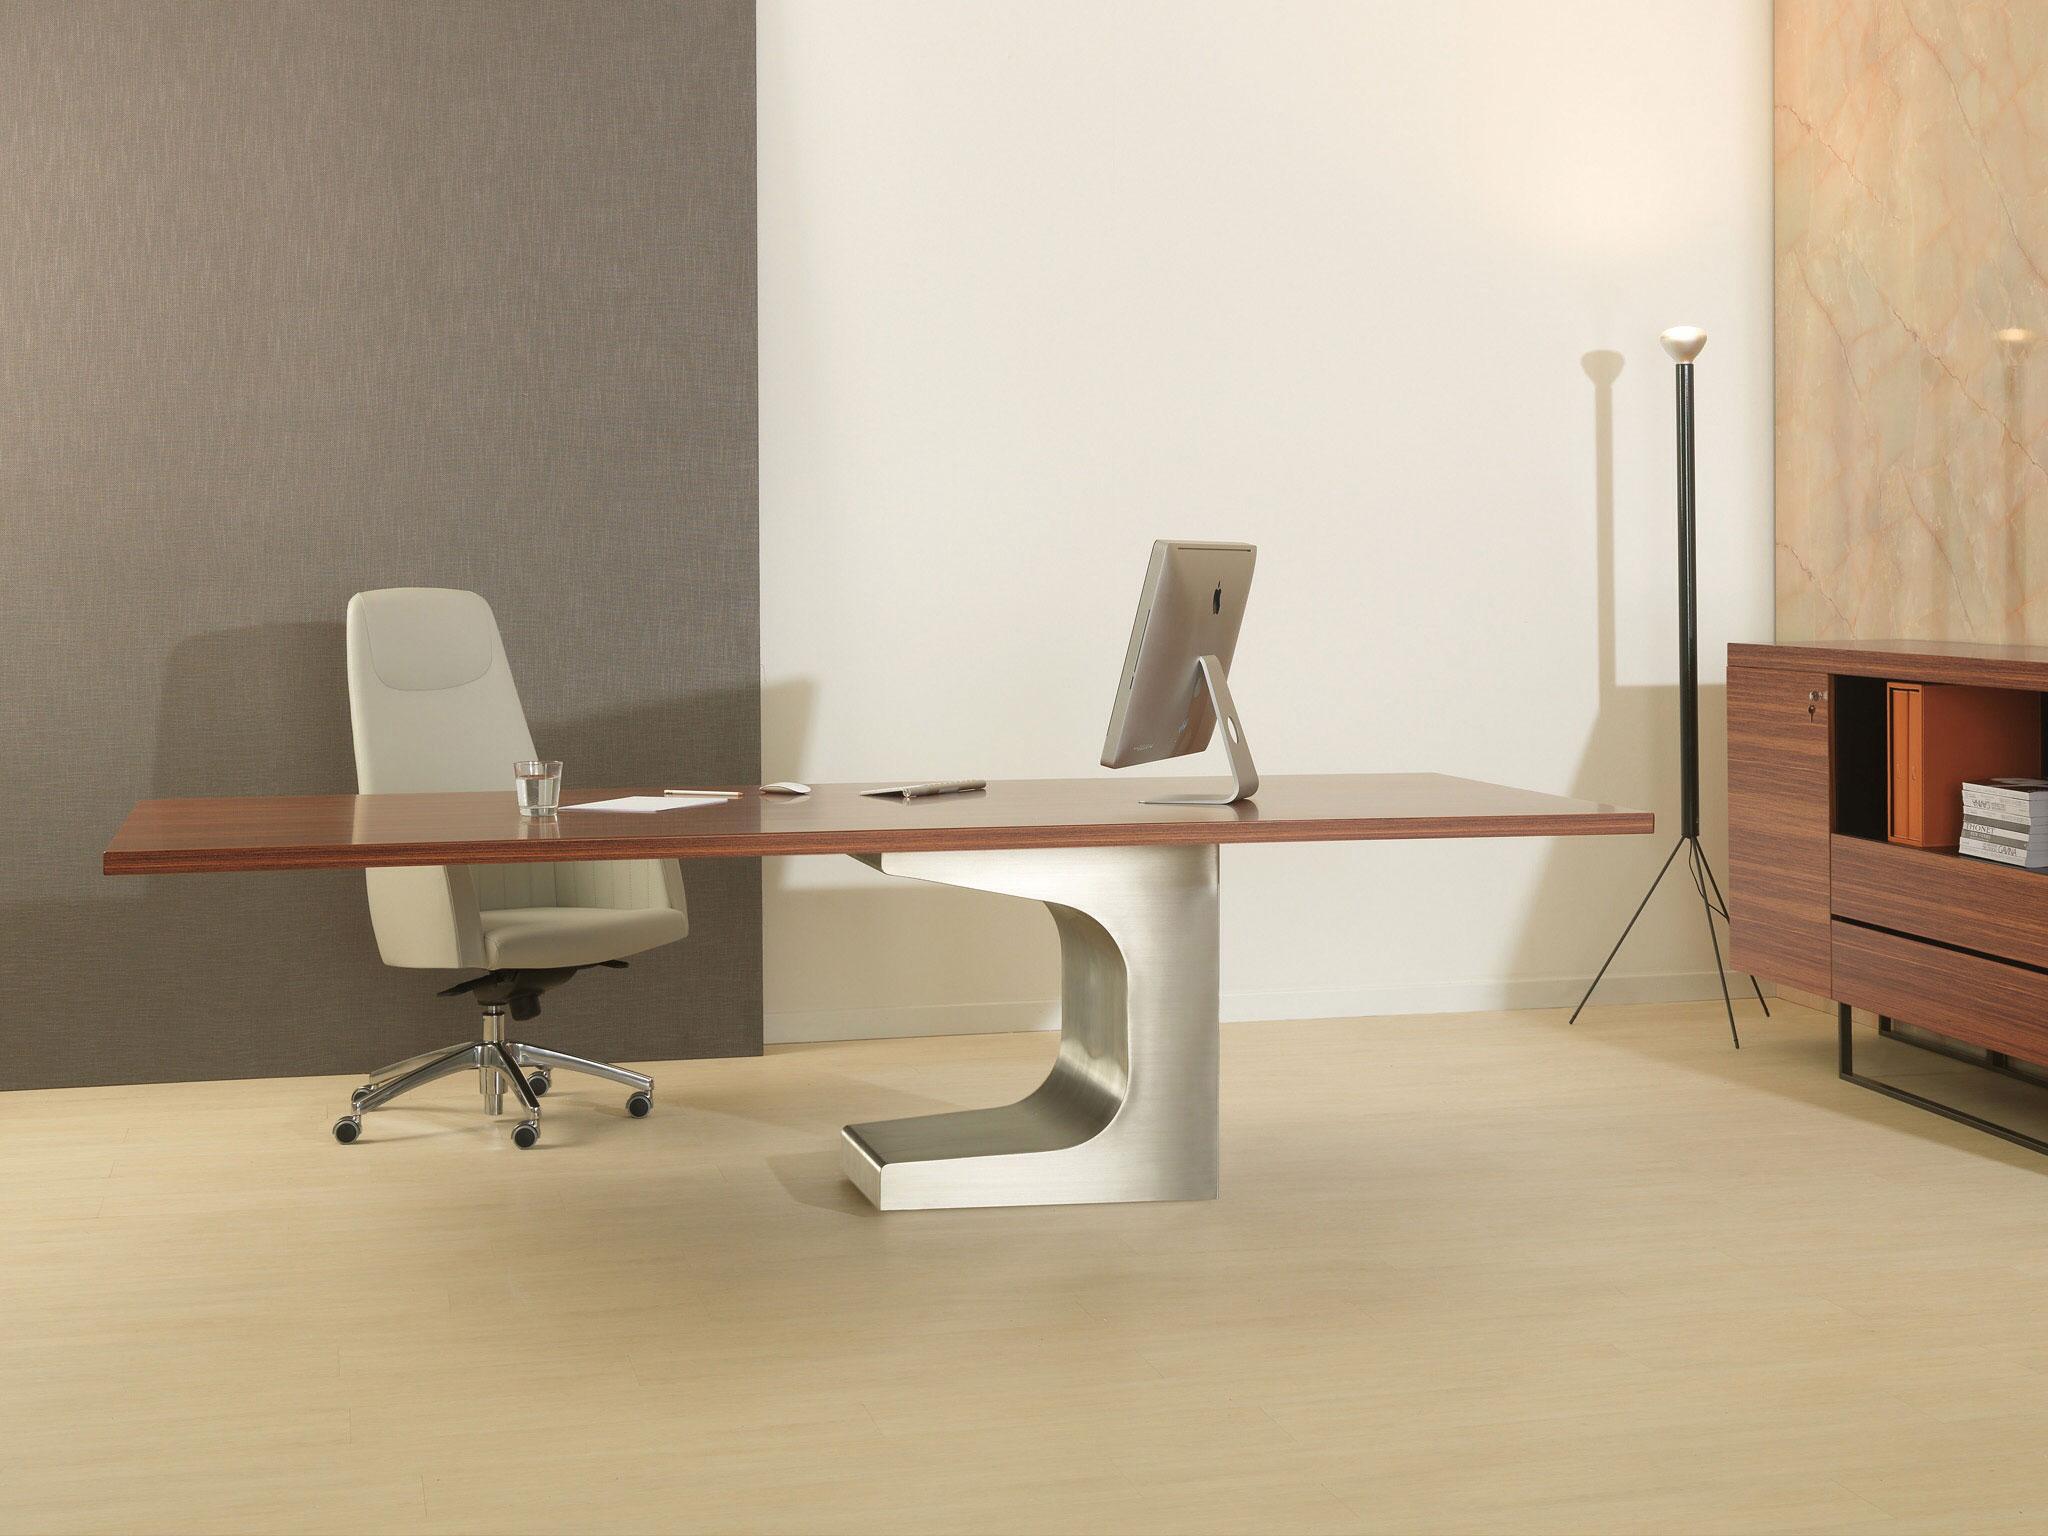 Ergonomia Scrivania Ufficio : Niemeyer toscana scrivanie da ufficio belardi arredamenti